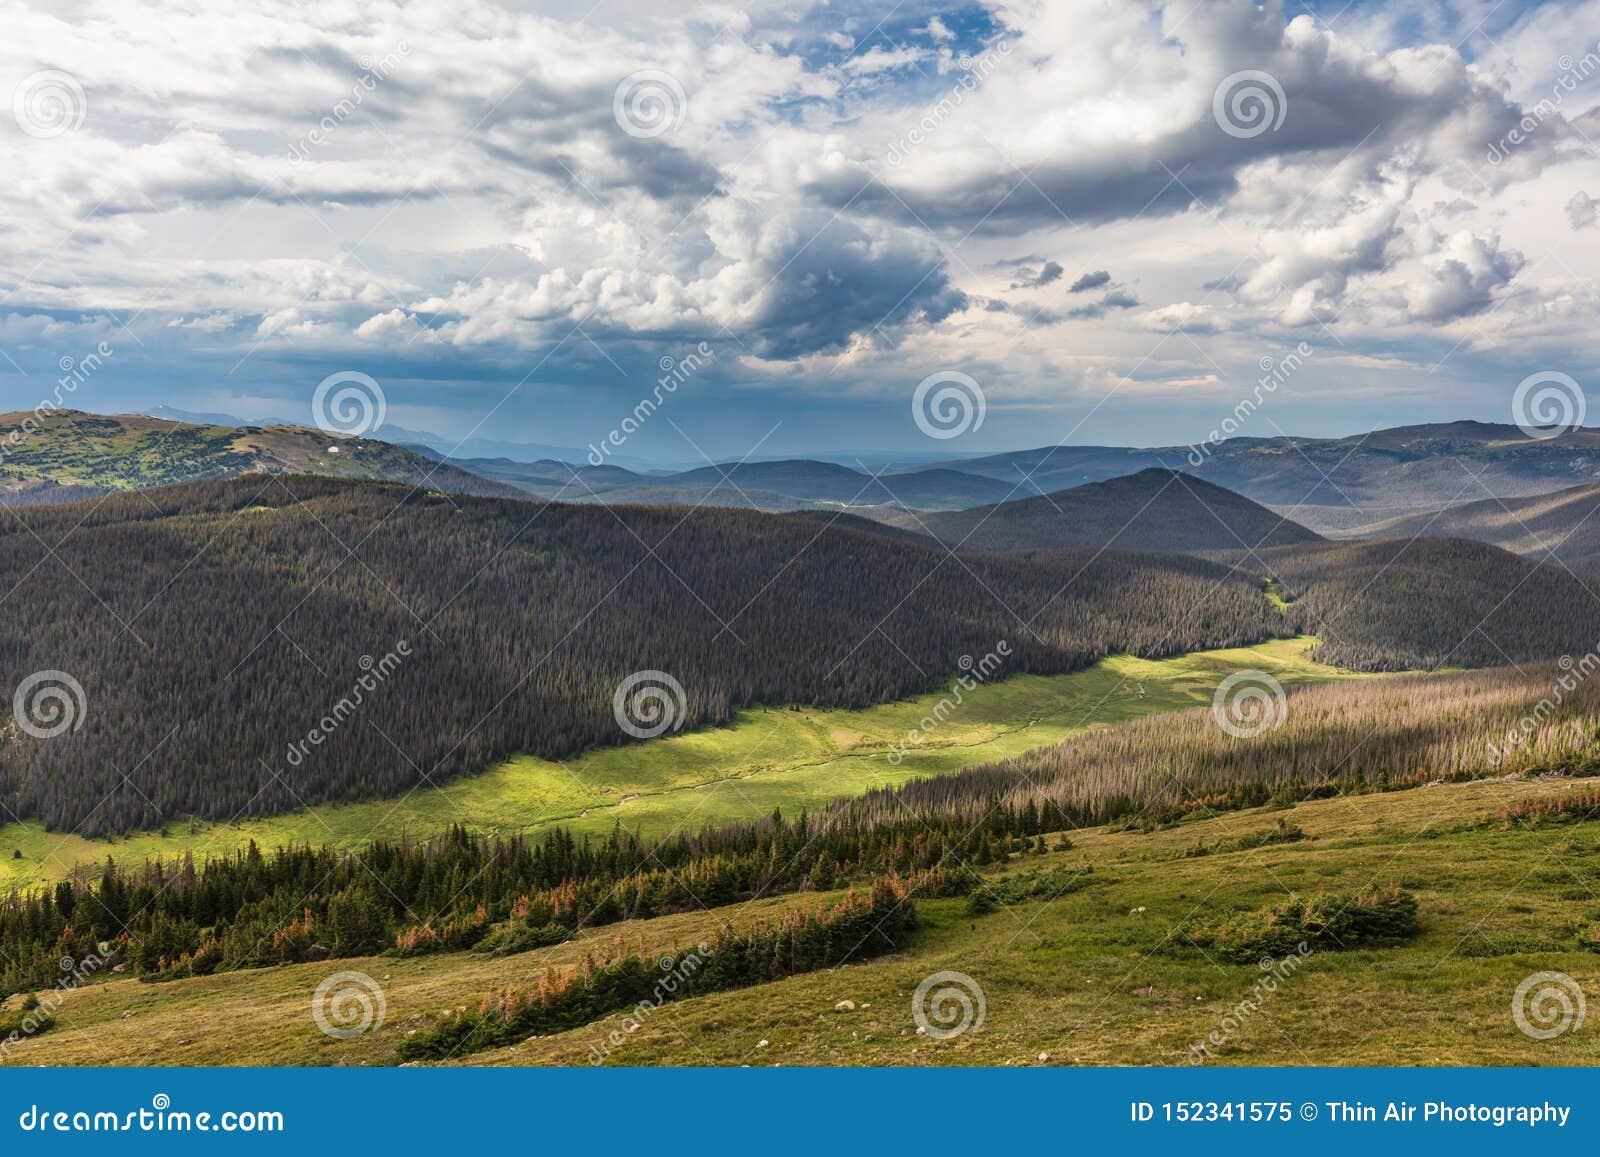 Summer on Trail Ridge, Trail Ridge Road, Rocky Mountain National Park, Colorado, USA